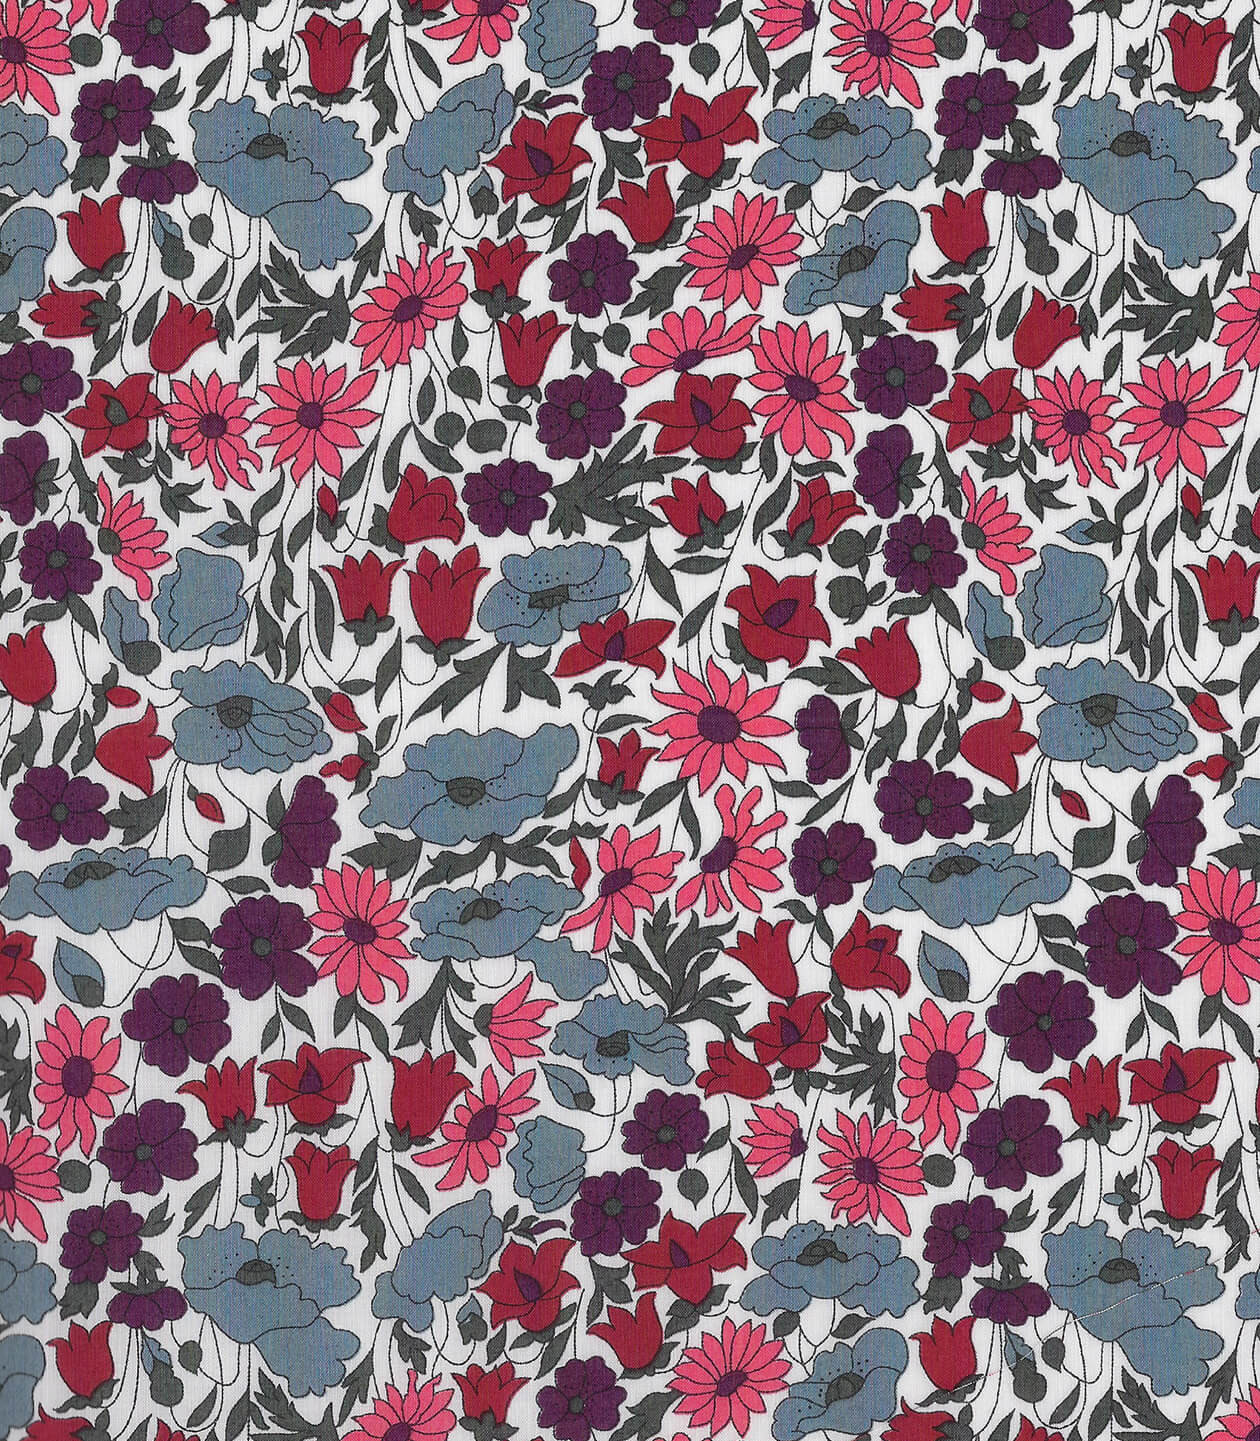 Tissu Liberty Poppy & Daisy Fruits des bois